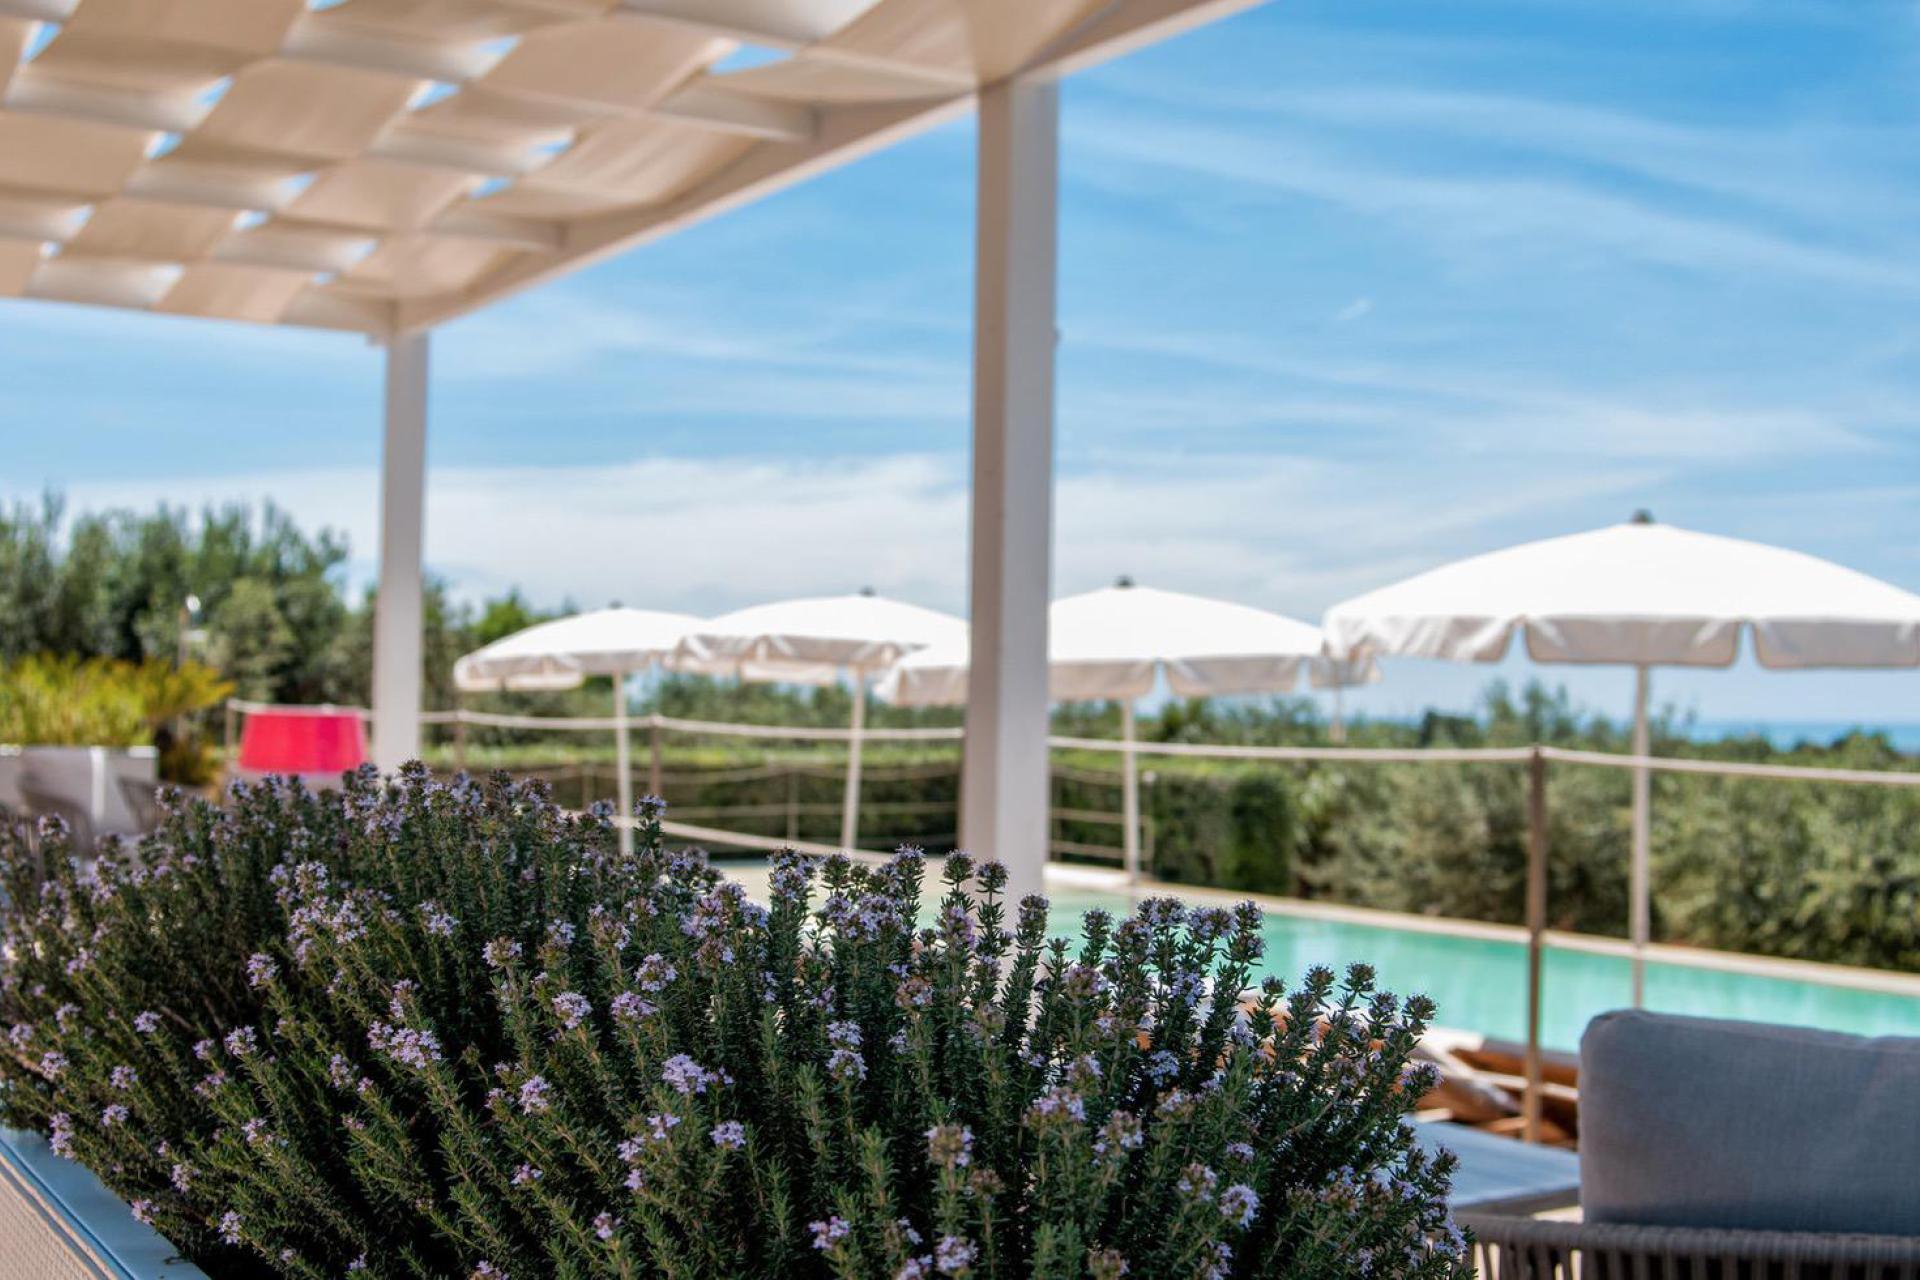 Agriturismo Sicilie Gemoedelijke agriturismo met restaurant op Sicilië, vlakbij zee